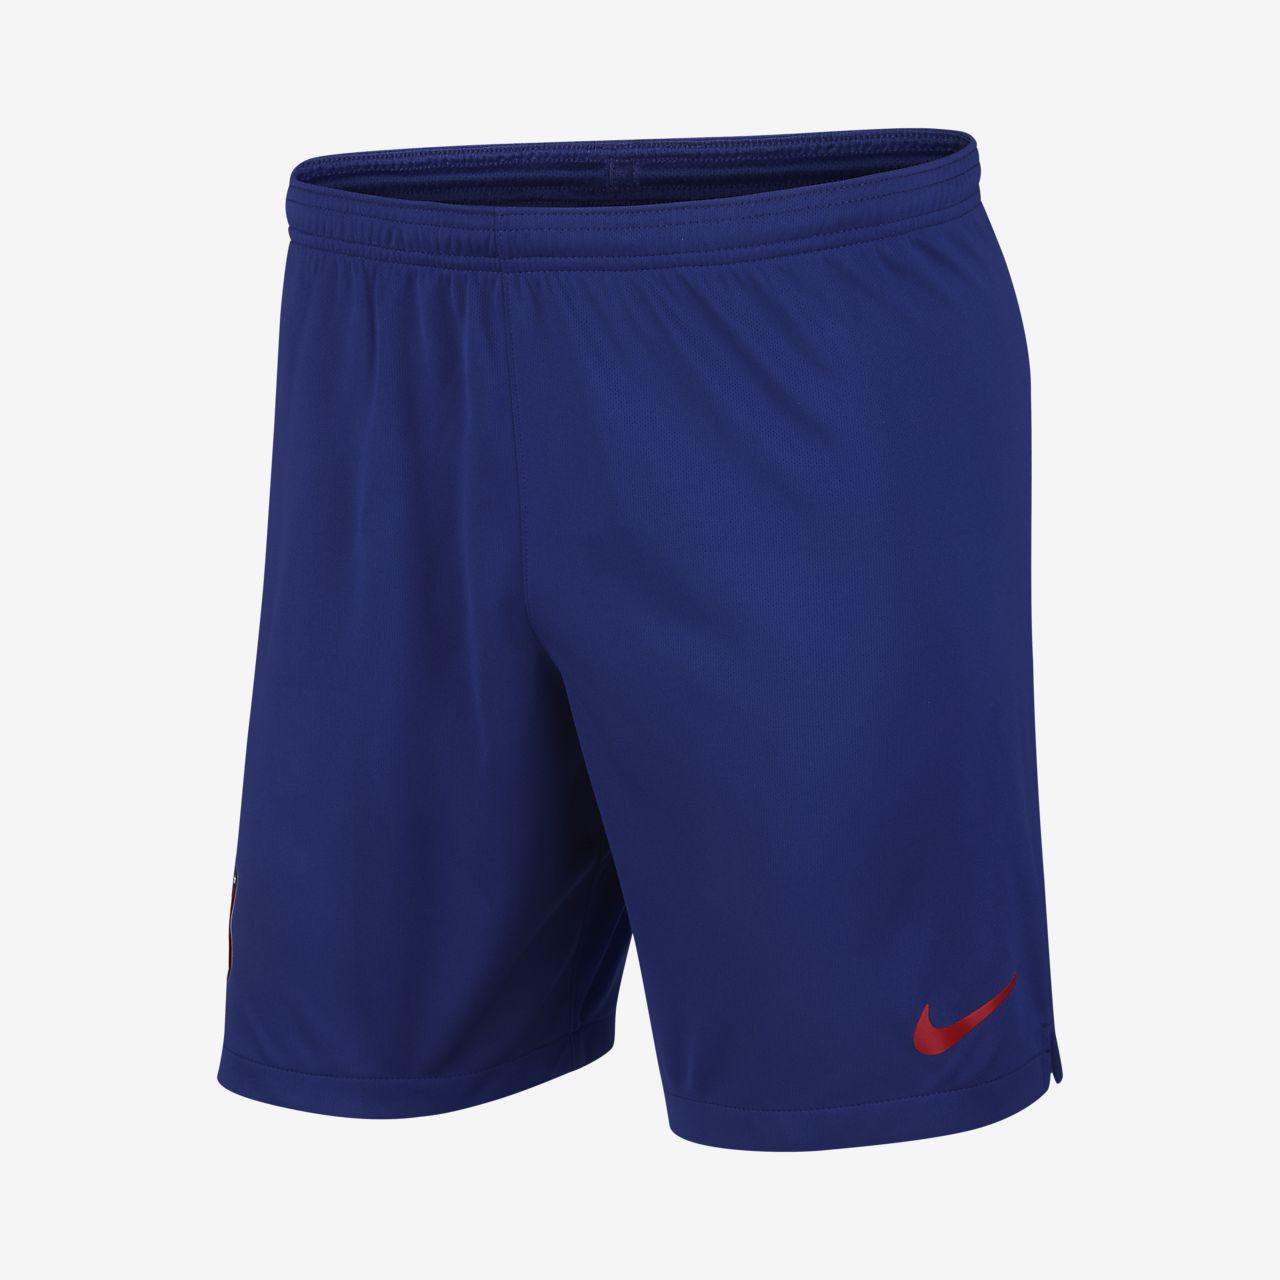 Atlético de Madrid 2019/20 Stadium Home/Away Men's Football Shorts